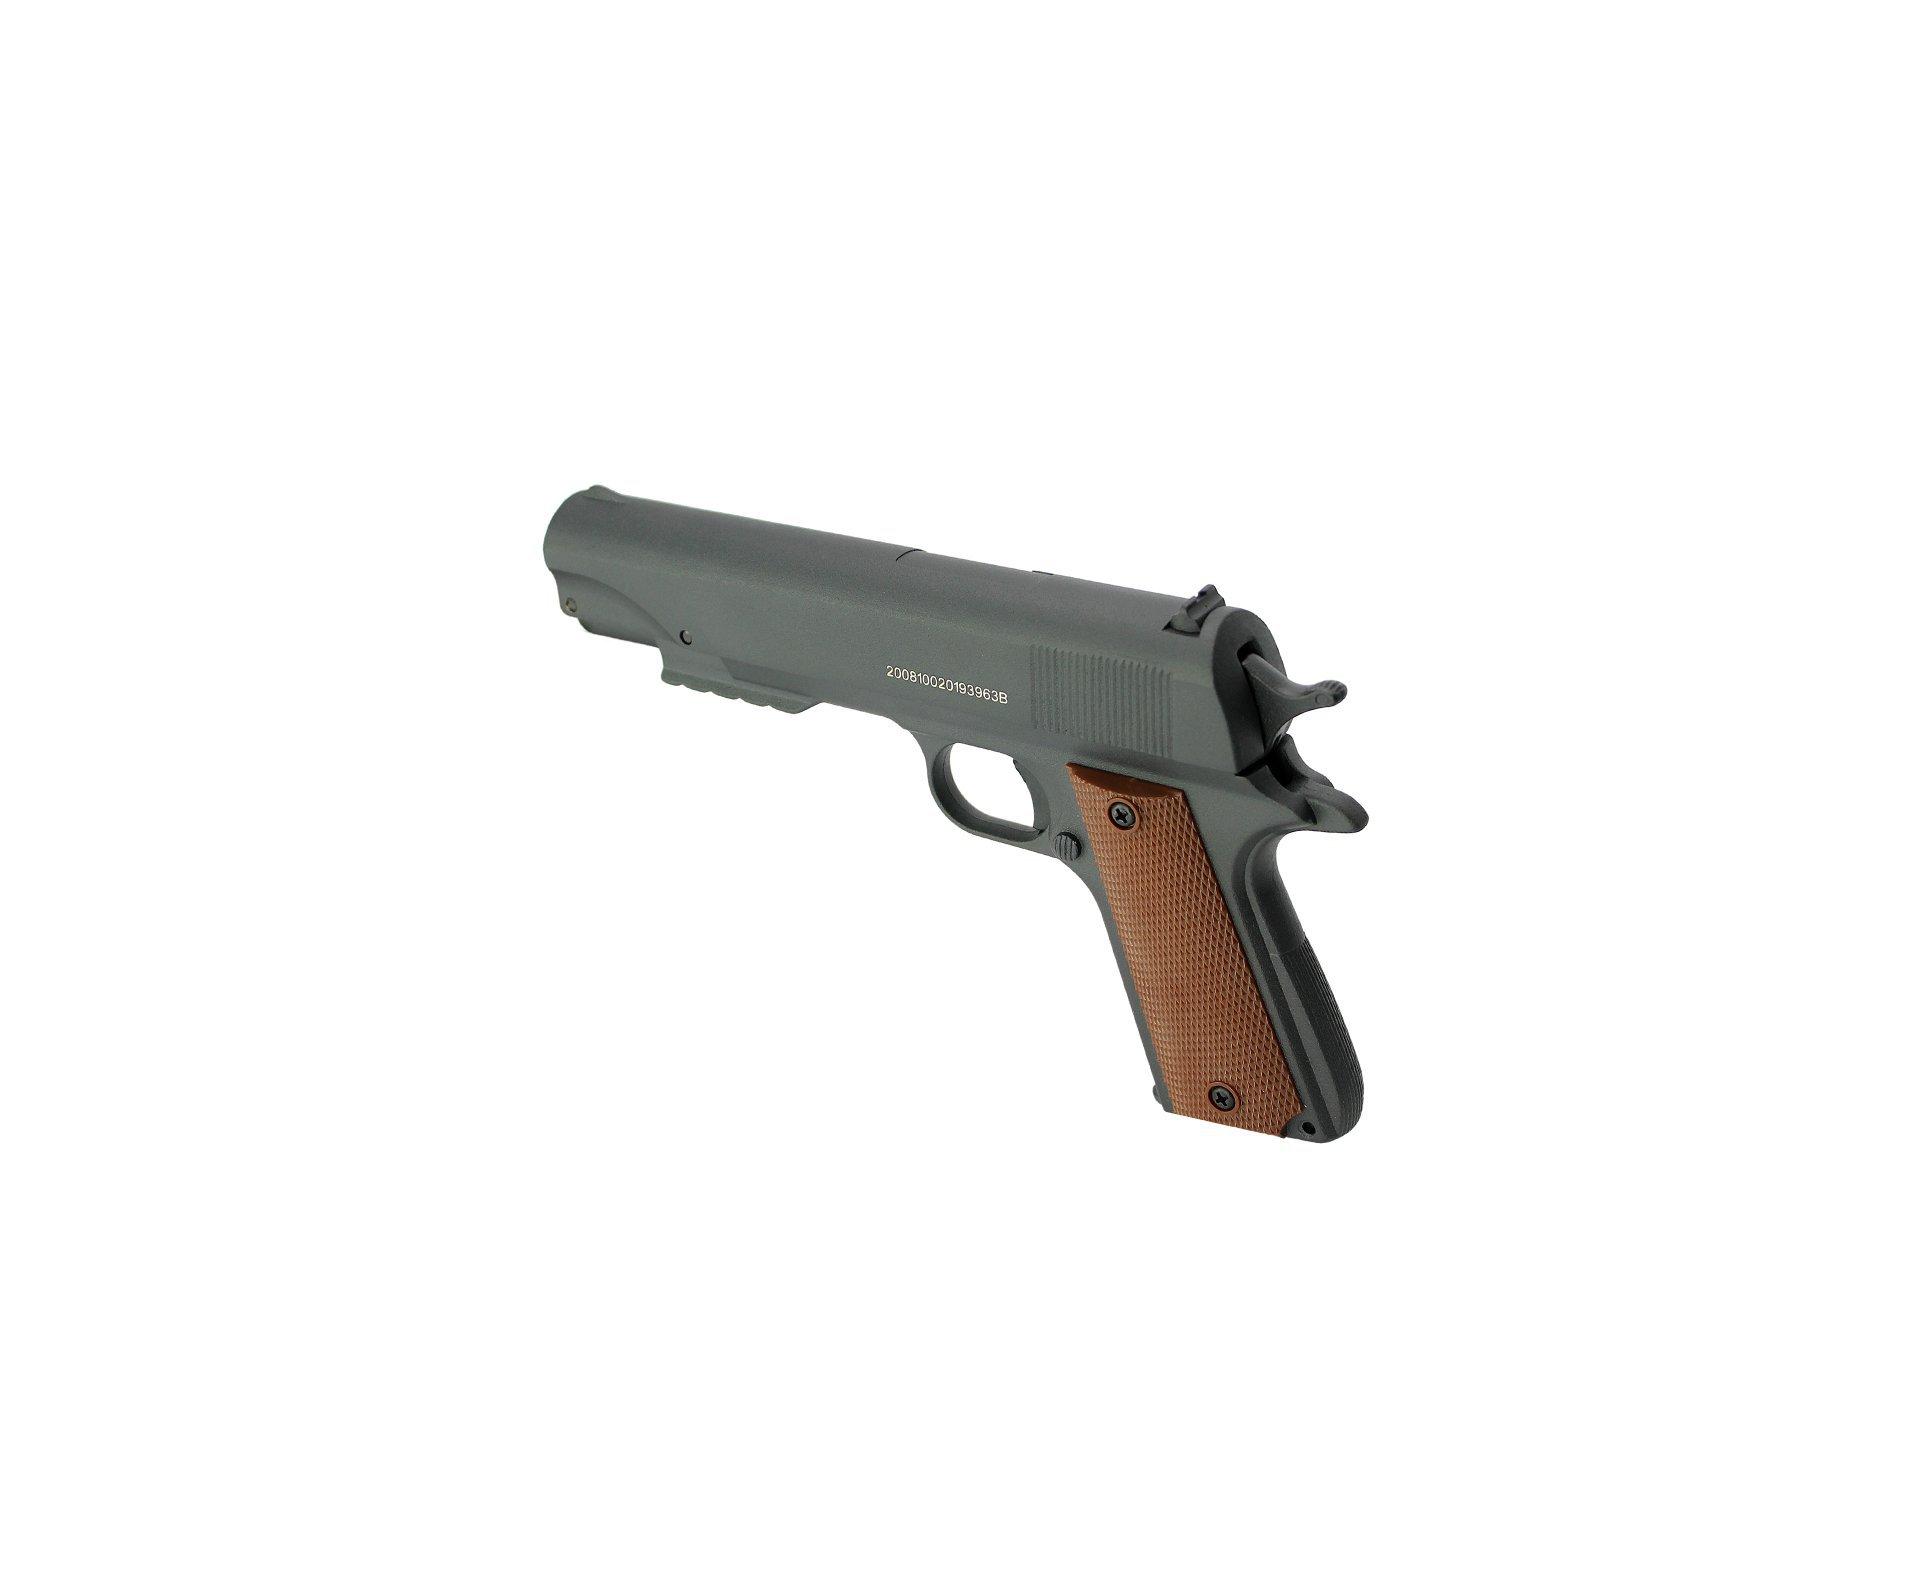 Pistola De Pressão Fox Multi Pump Cal 5,5mm Qgk By Spa